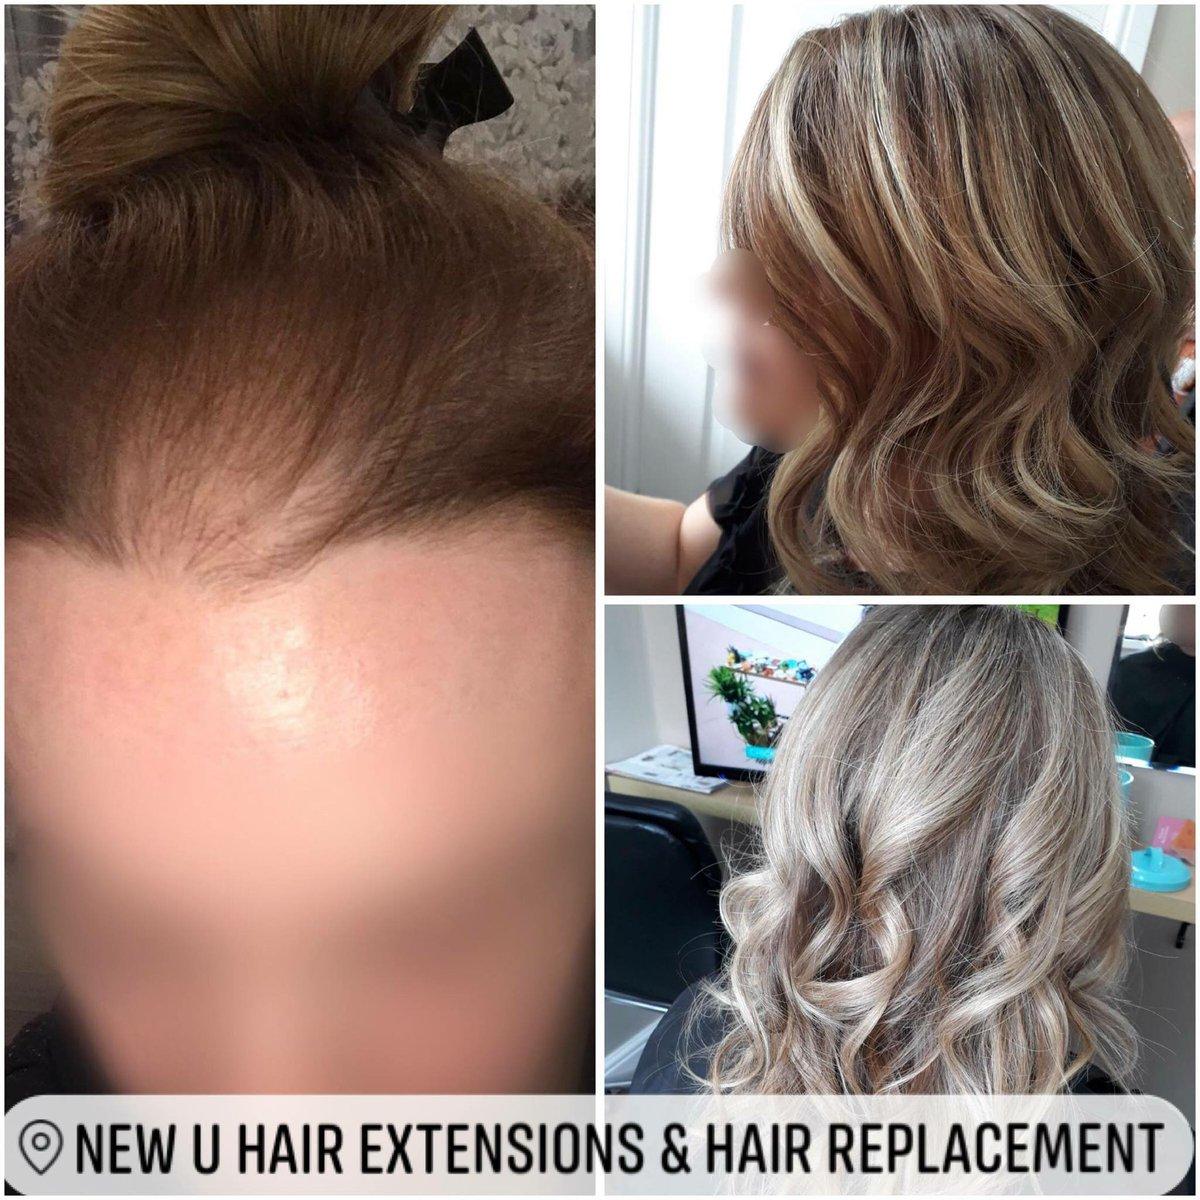 New U Hair Extension Hair Replacement Simonenewu Twitter